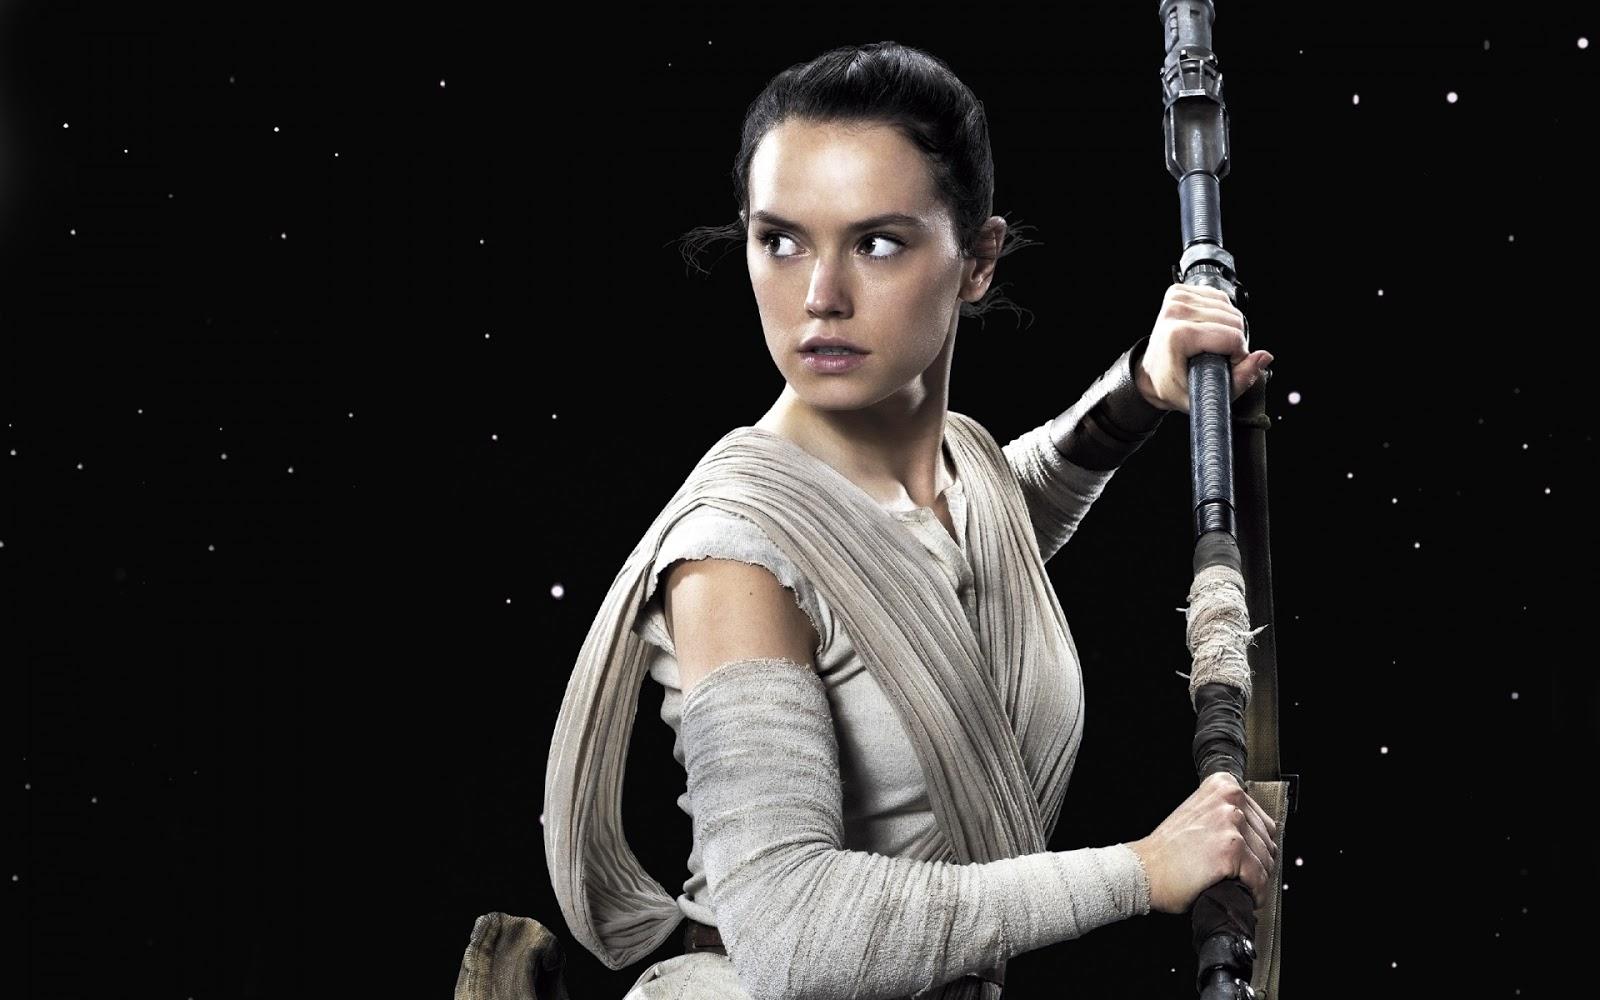 Daisy Ridley Star Wars full HD Wallpaper 1080p